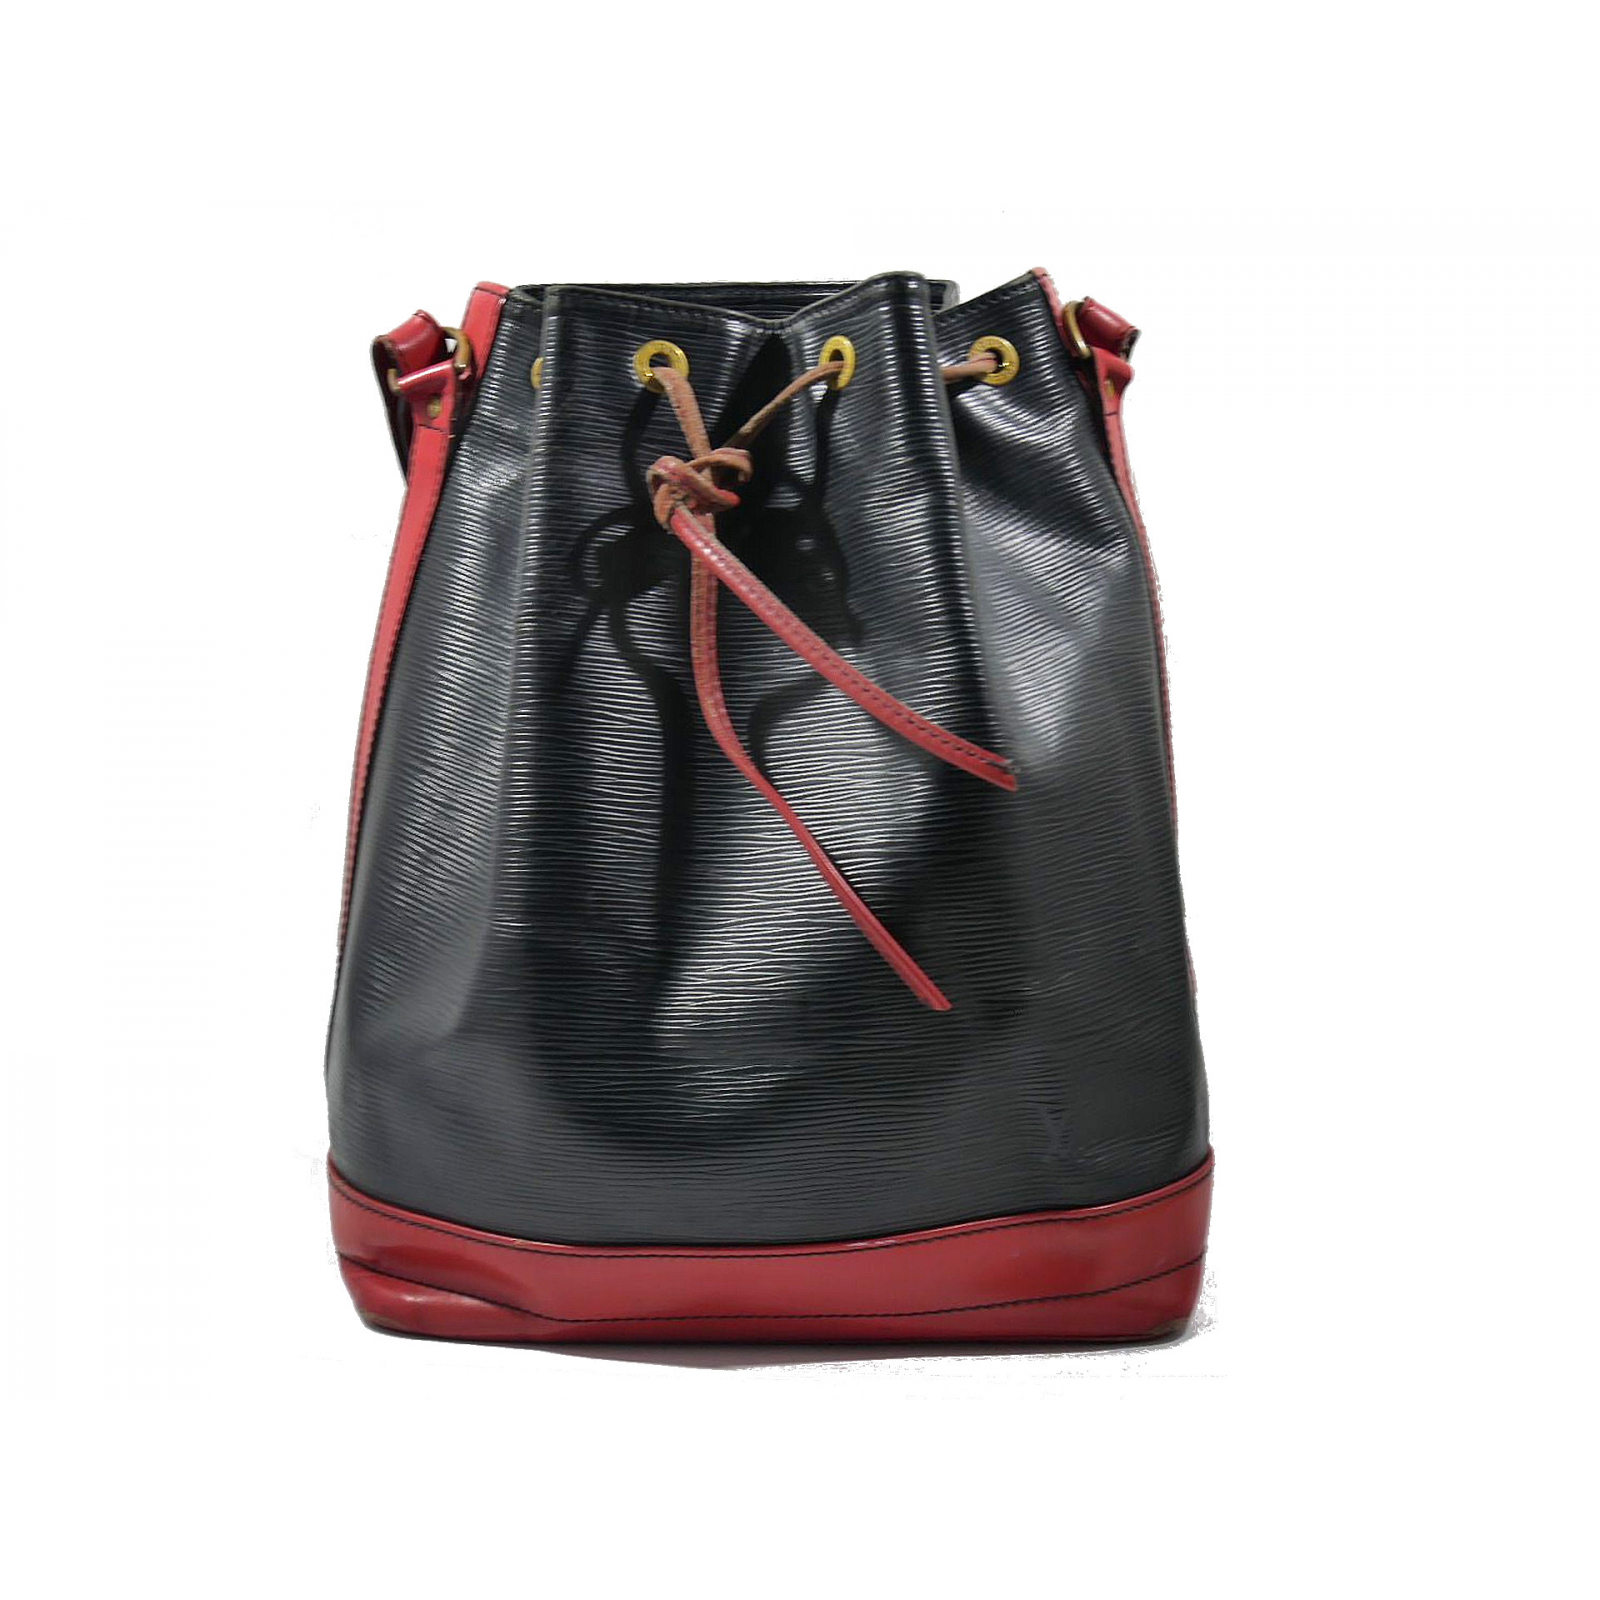 Torebka worek Noe Gm Louis Vuitton epi